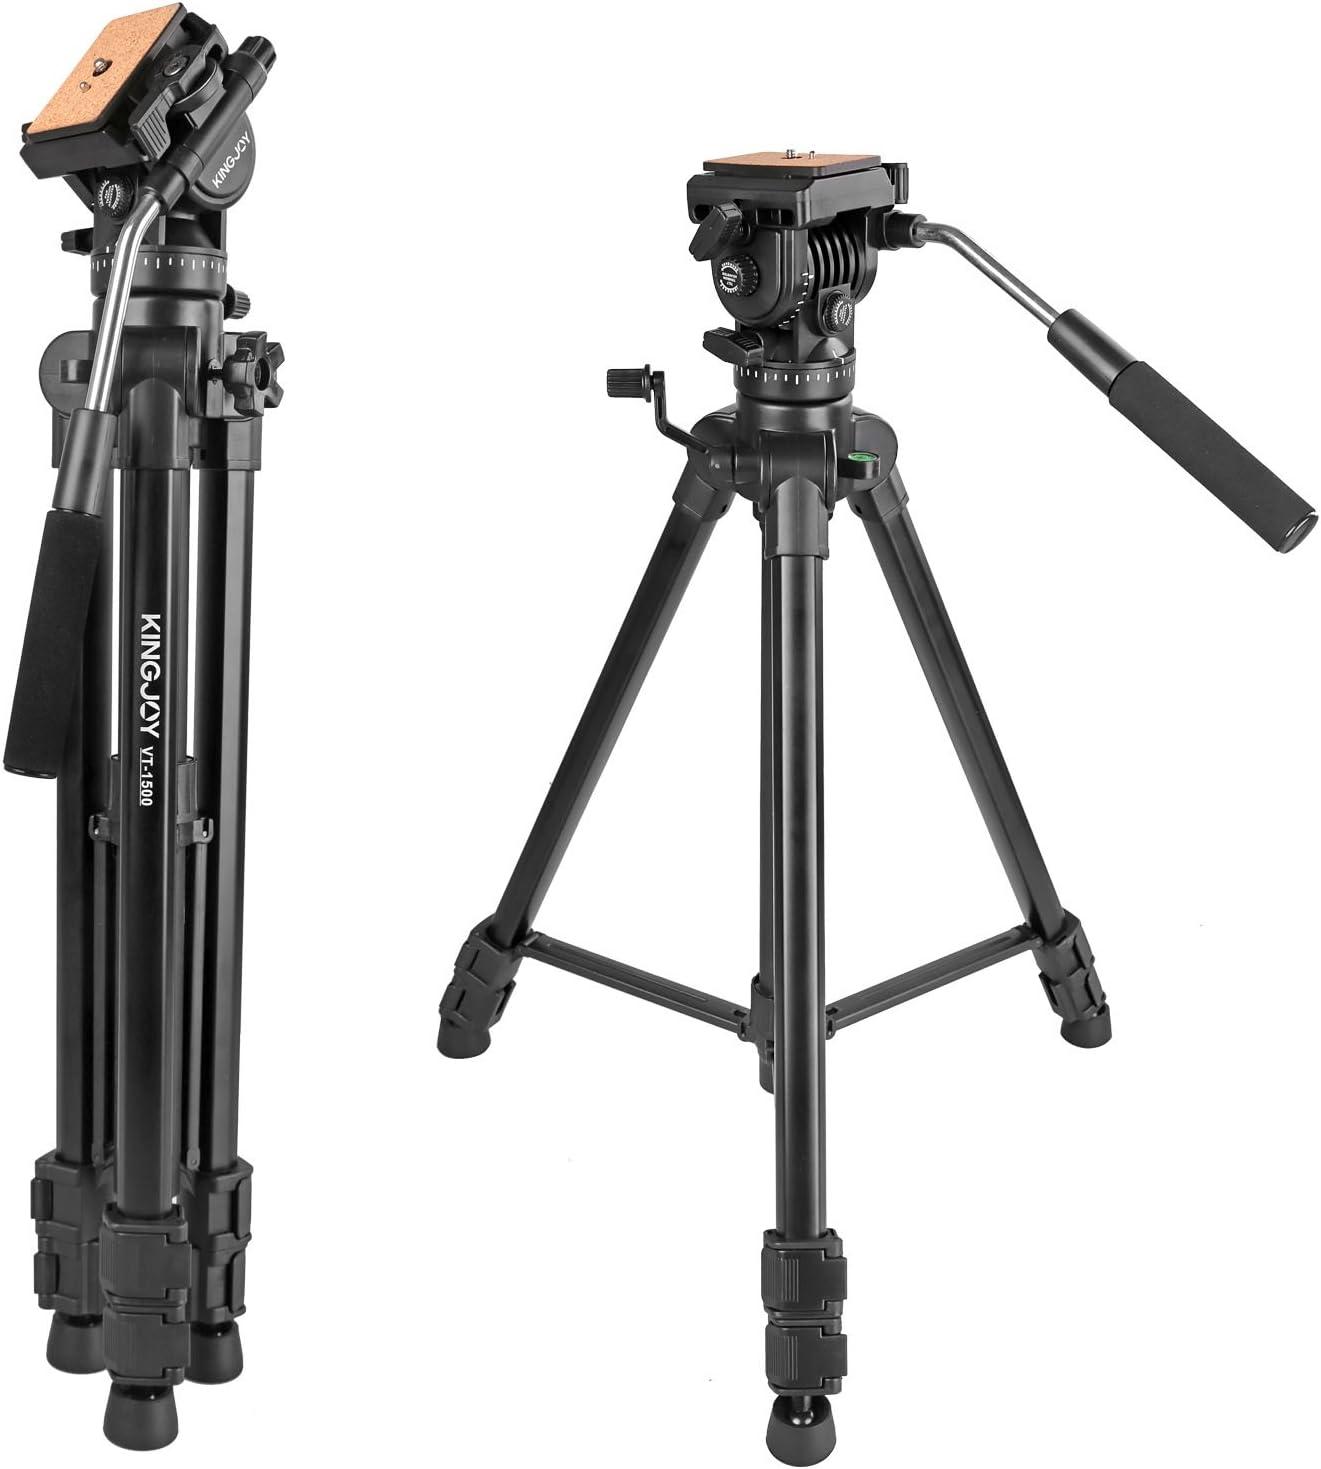 Video Tripod with Fluid Head, Kamisafe KINGJOY VT-1500 Heavy Duty Camera Tripod Travel Tripod Aluminum Compatible for DSLR SLR Nikon Canon Sony Camcorder DV with Carry Bag